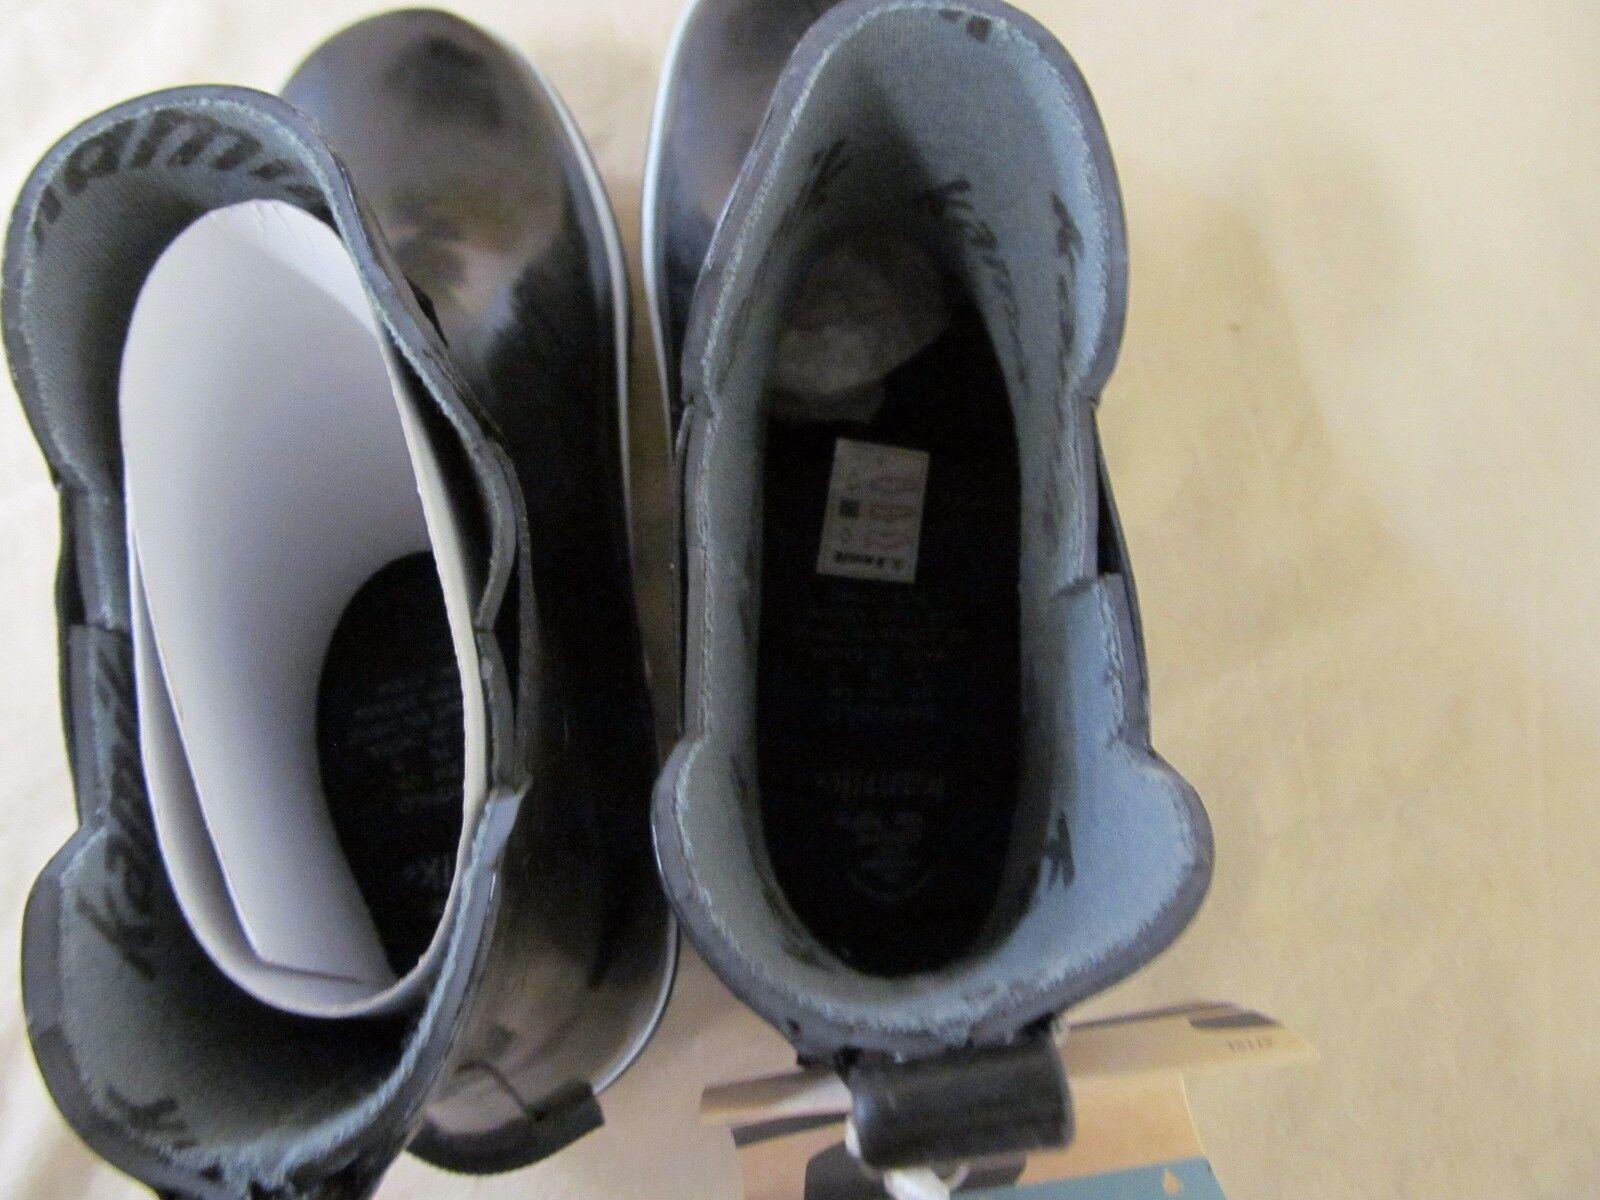 Women's 7 M Kamik Black Rubber Sharonlo Waterproof Ankle Ankle Ankle Rainboots P7028968 607372